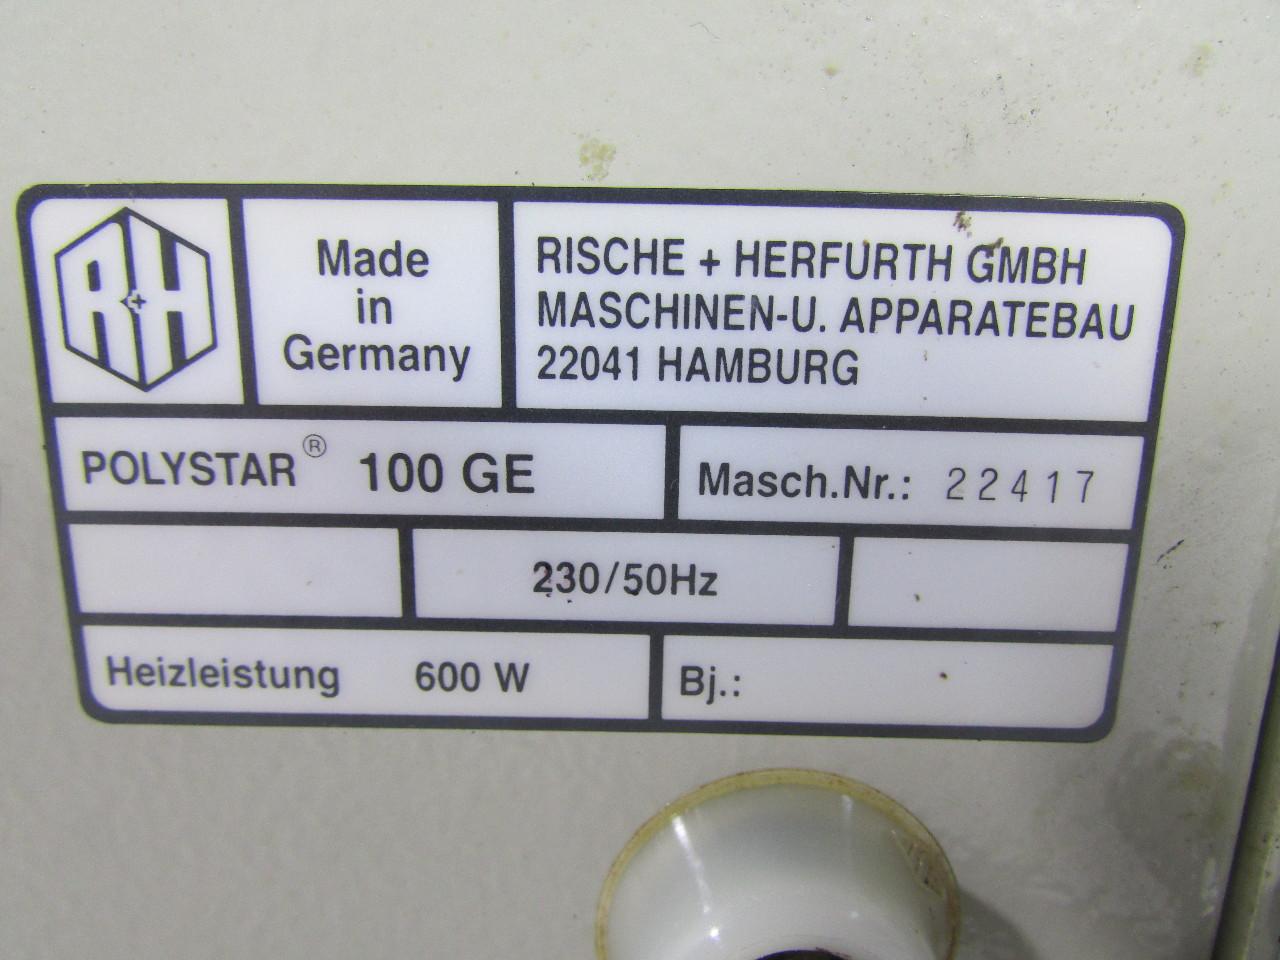 Herfurth Gmbh rische herfurth polystar 100 ge portable impulse tong sealer